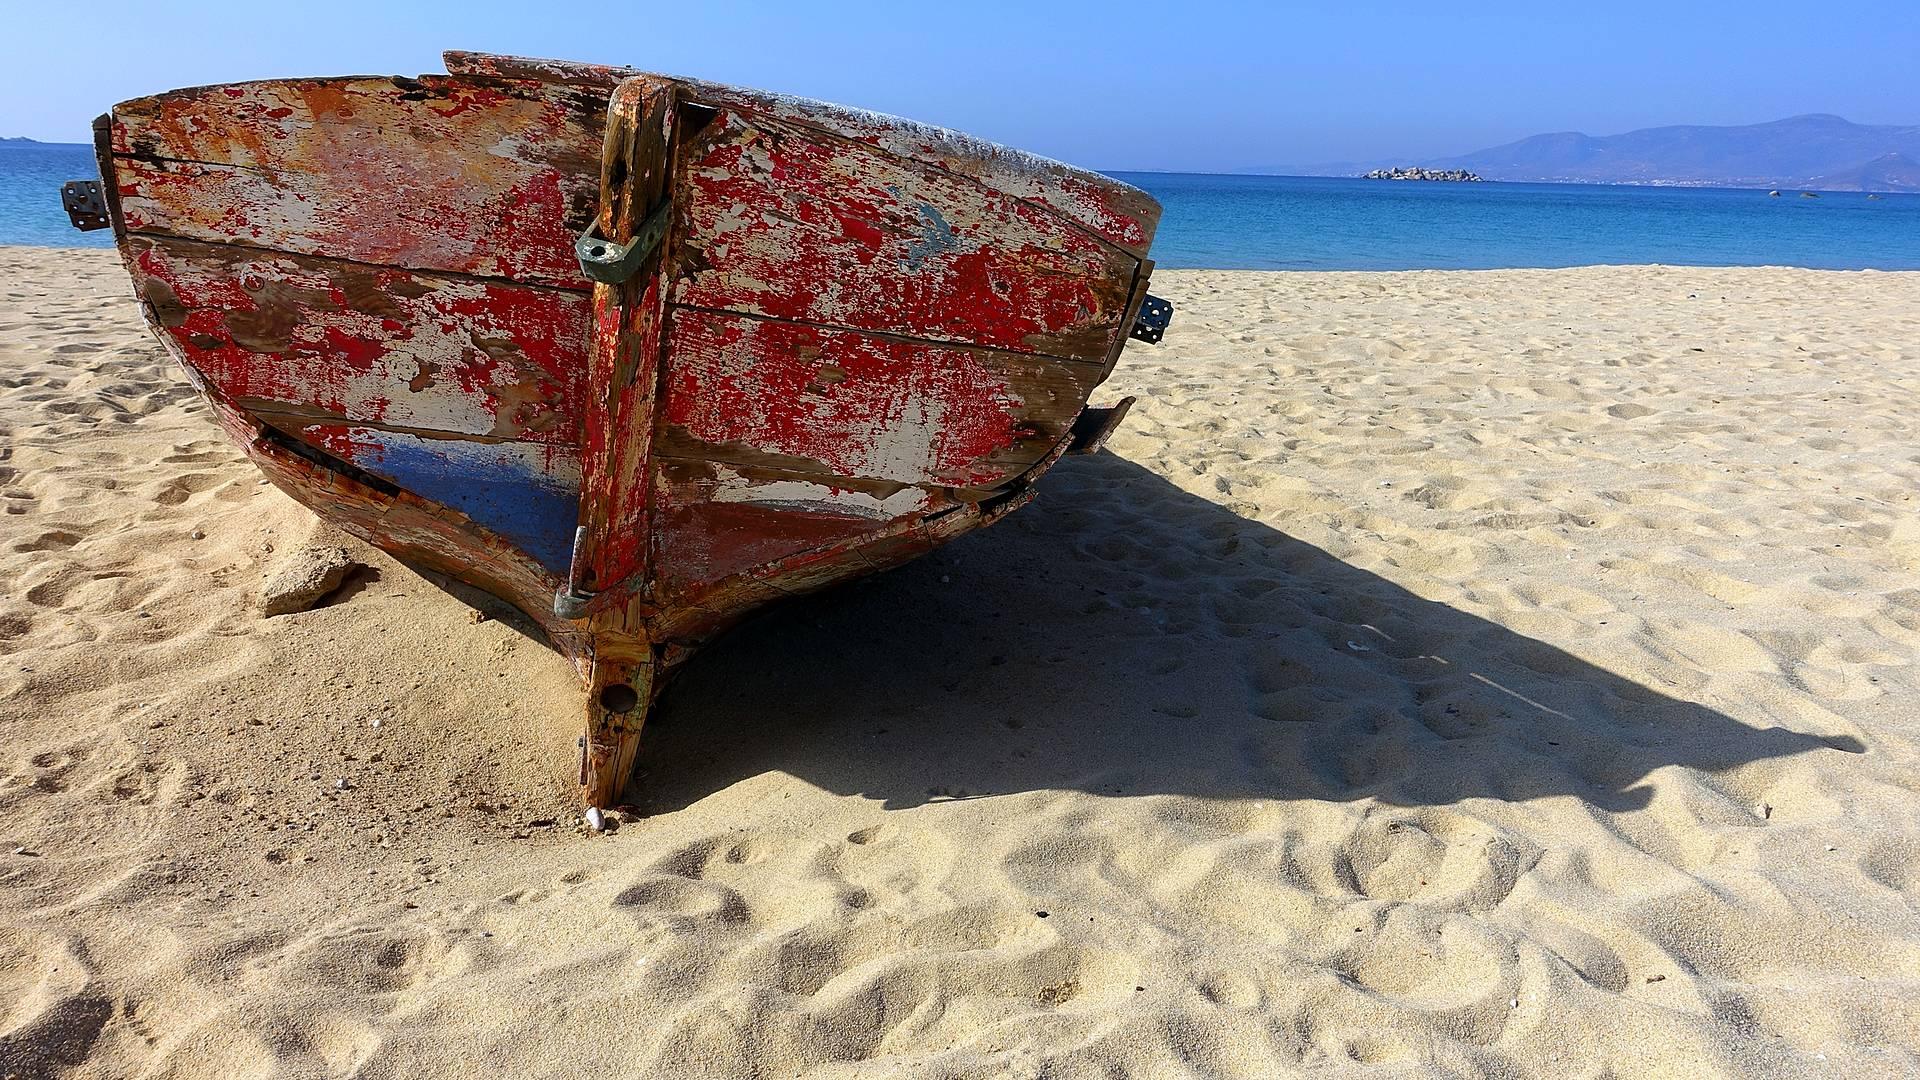 Island hopping nelle isole Cicladi